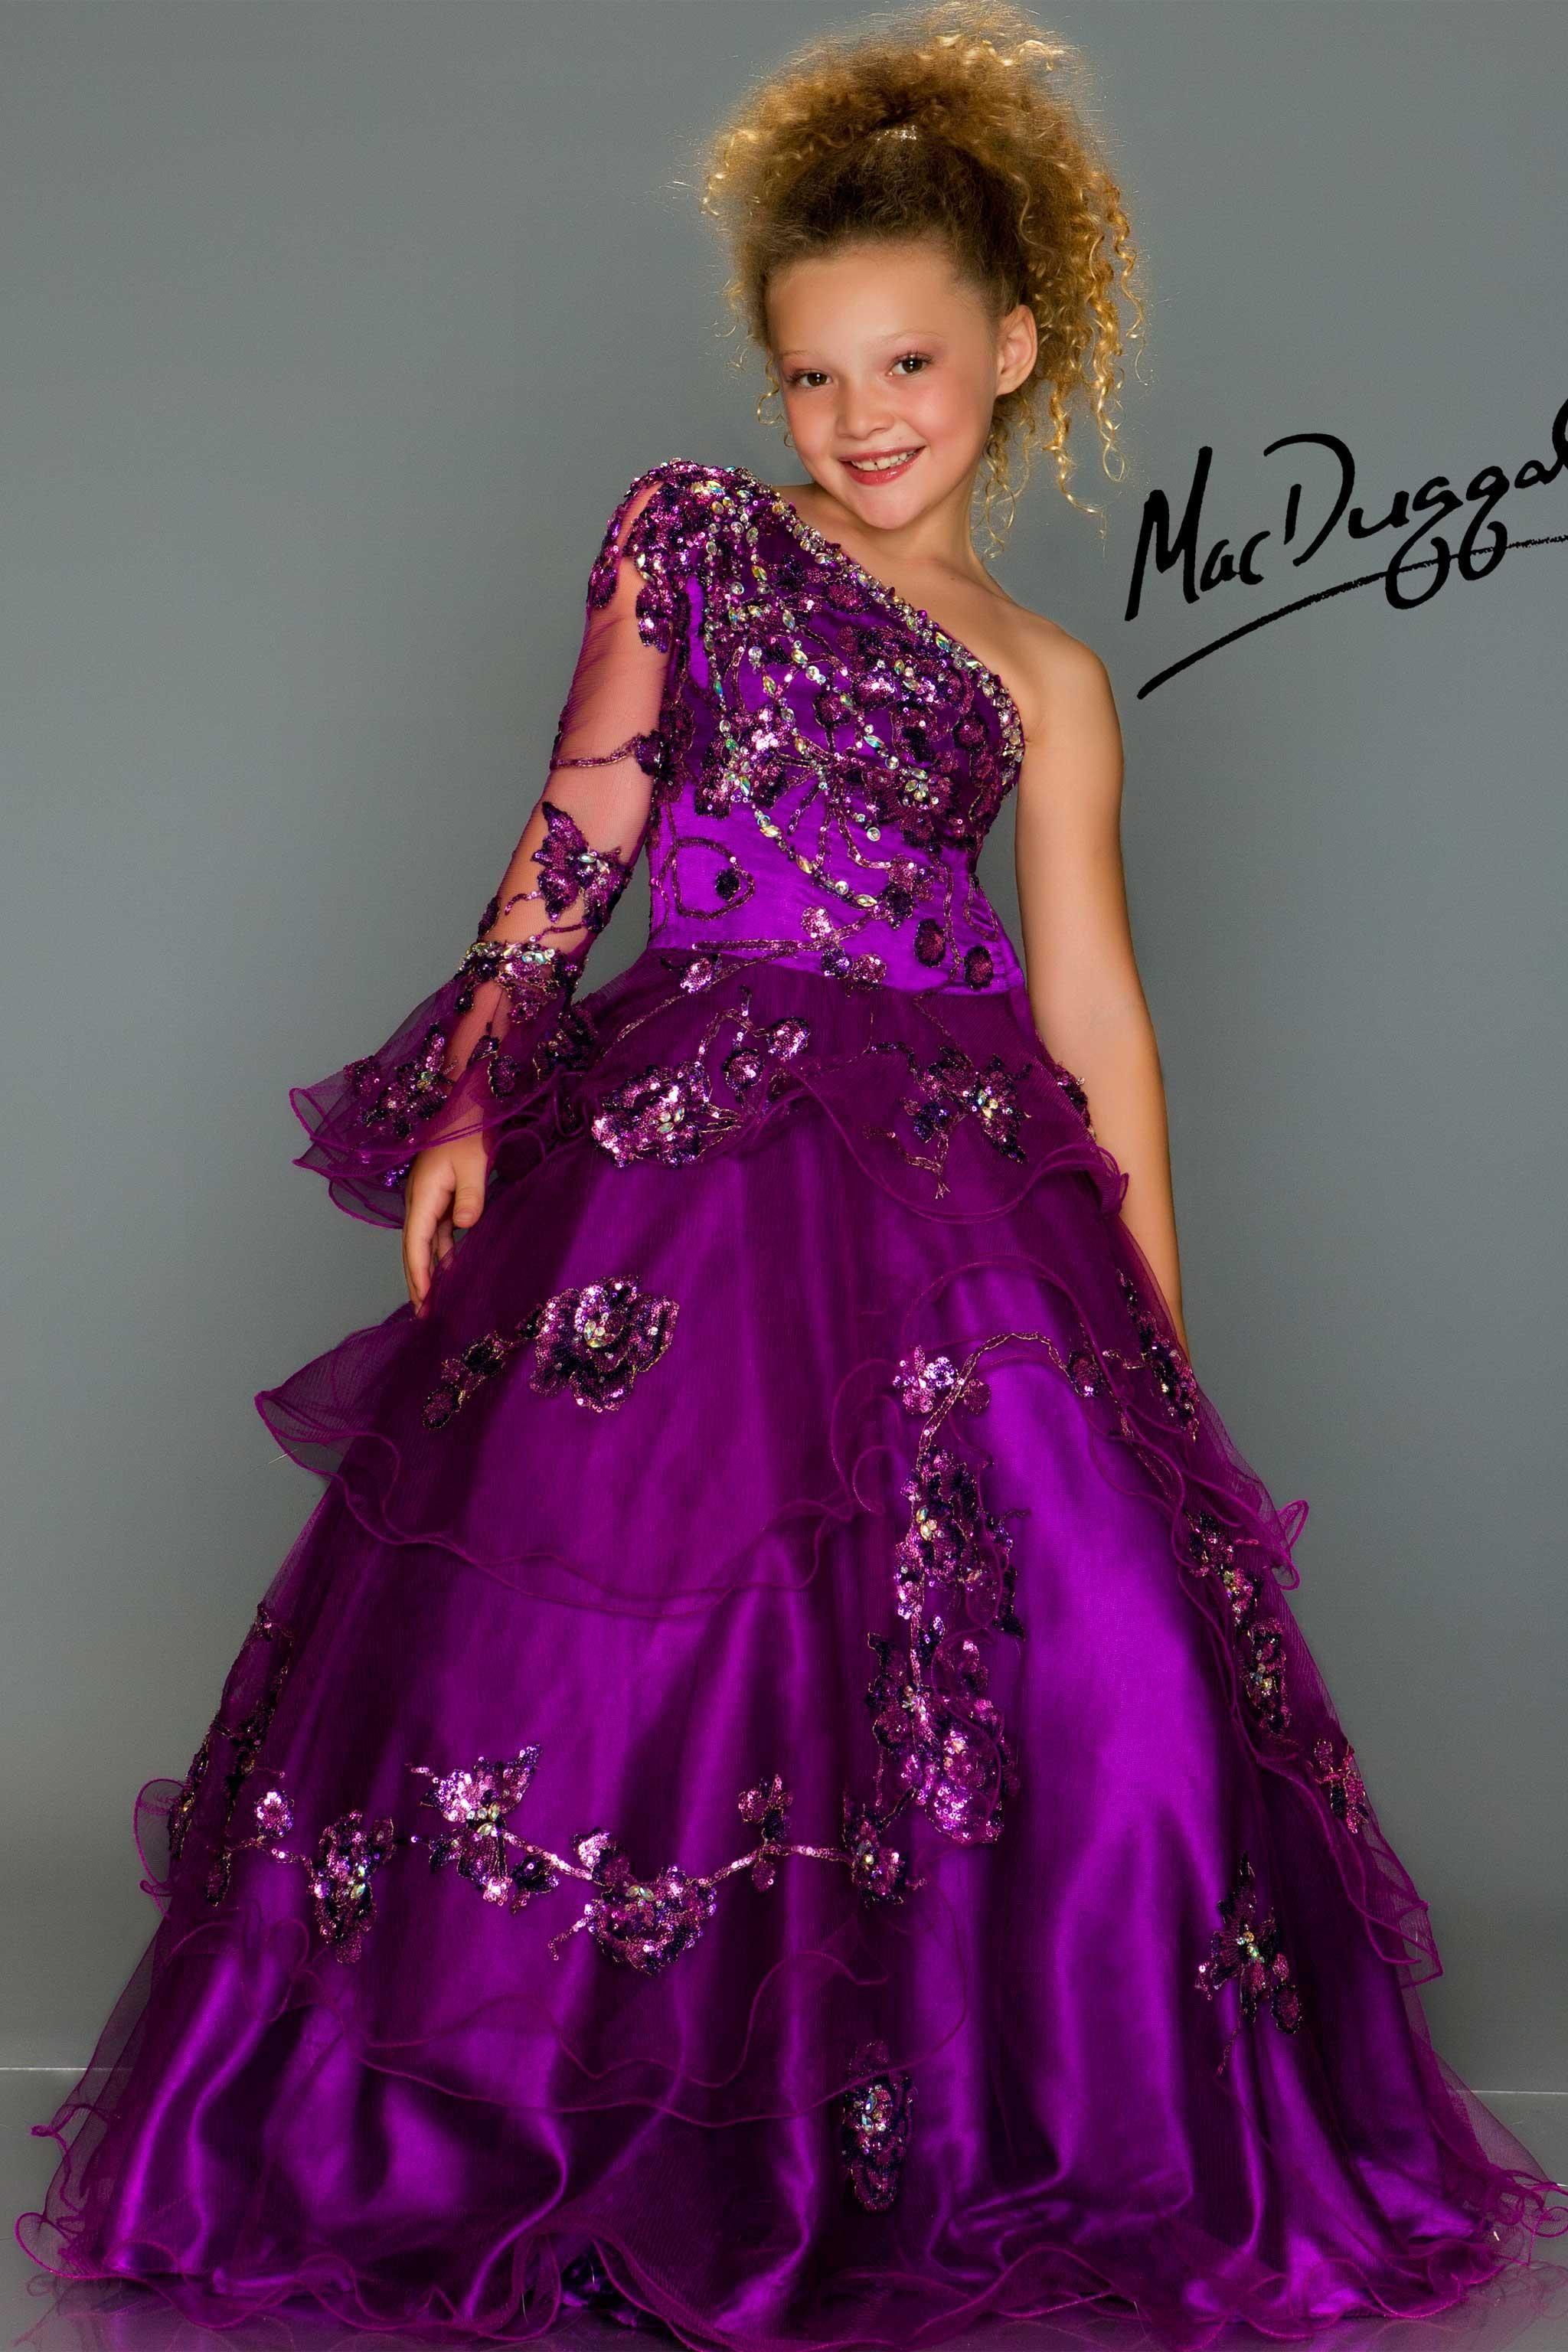 Purple Little Girls Pageant Dress | Pageant Pics | Pinterest ...